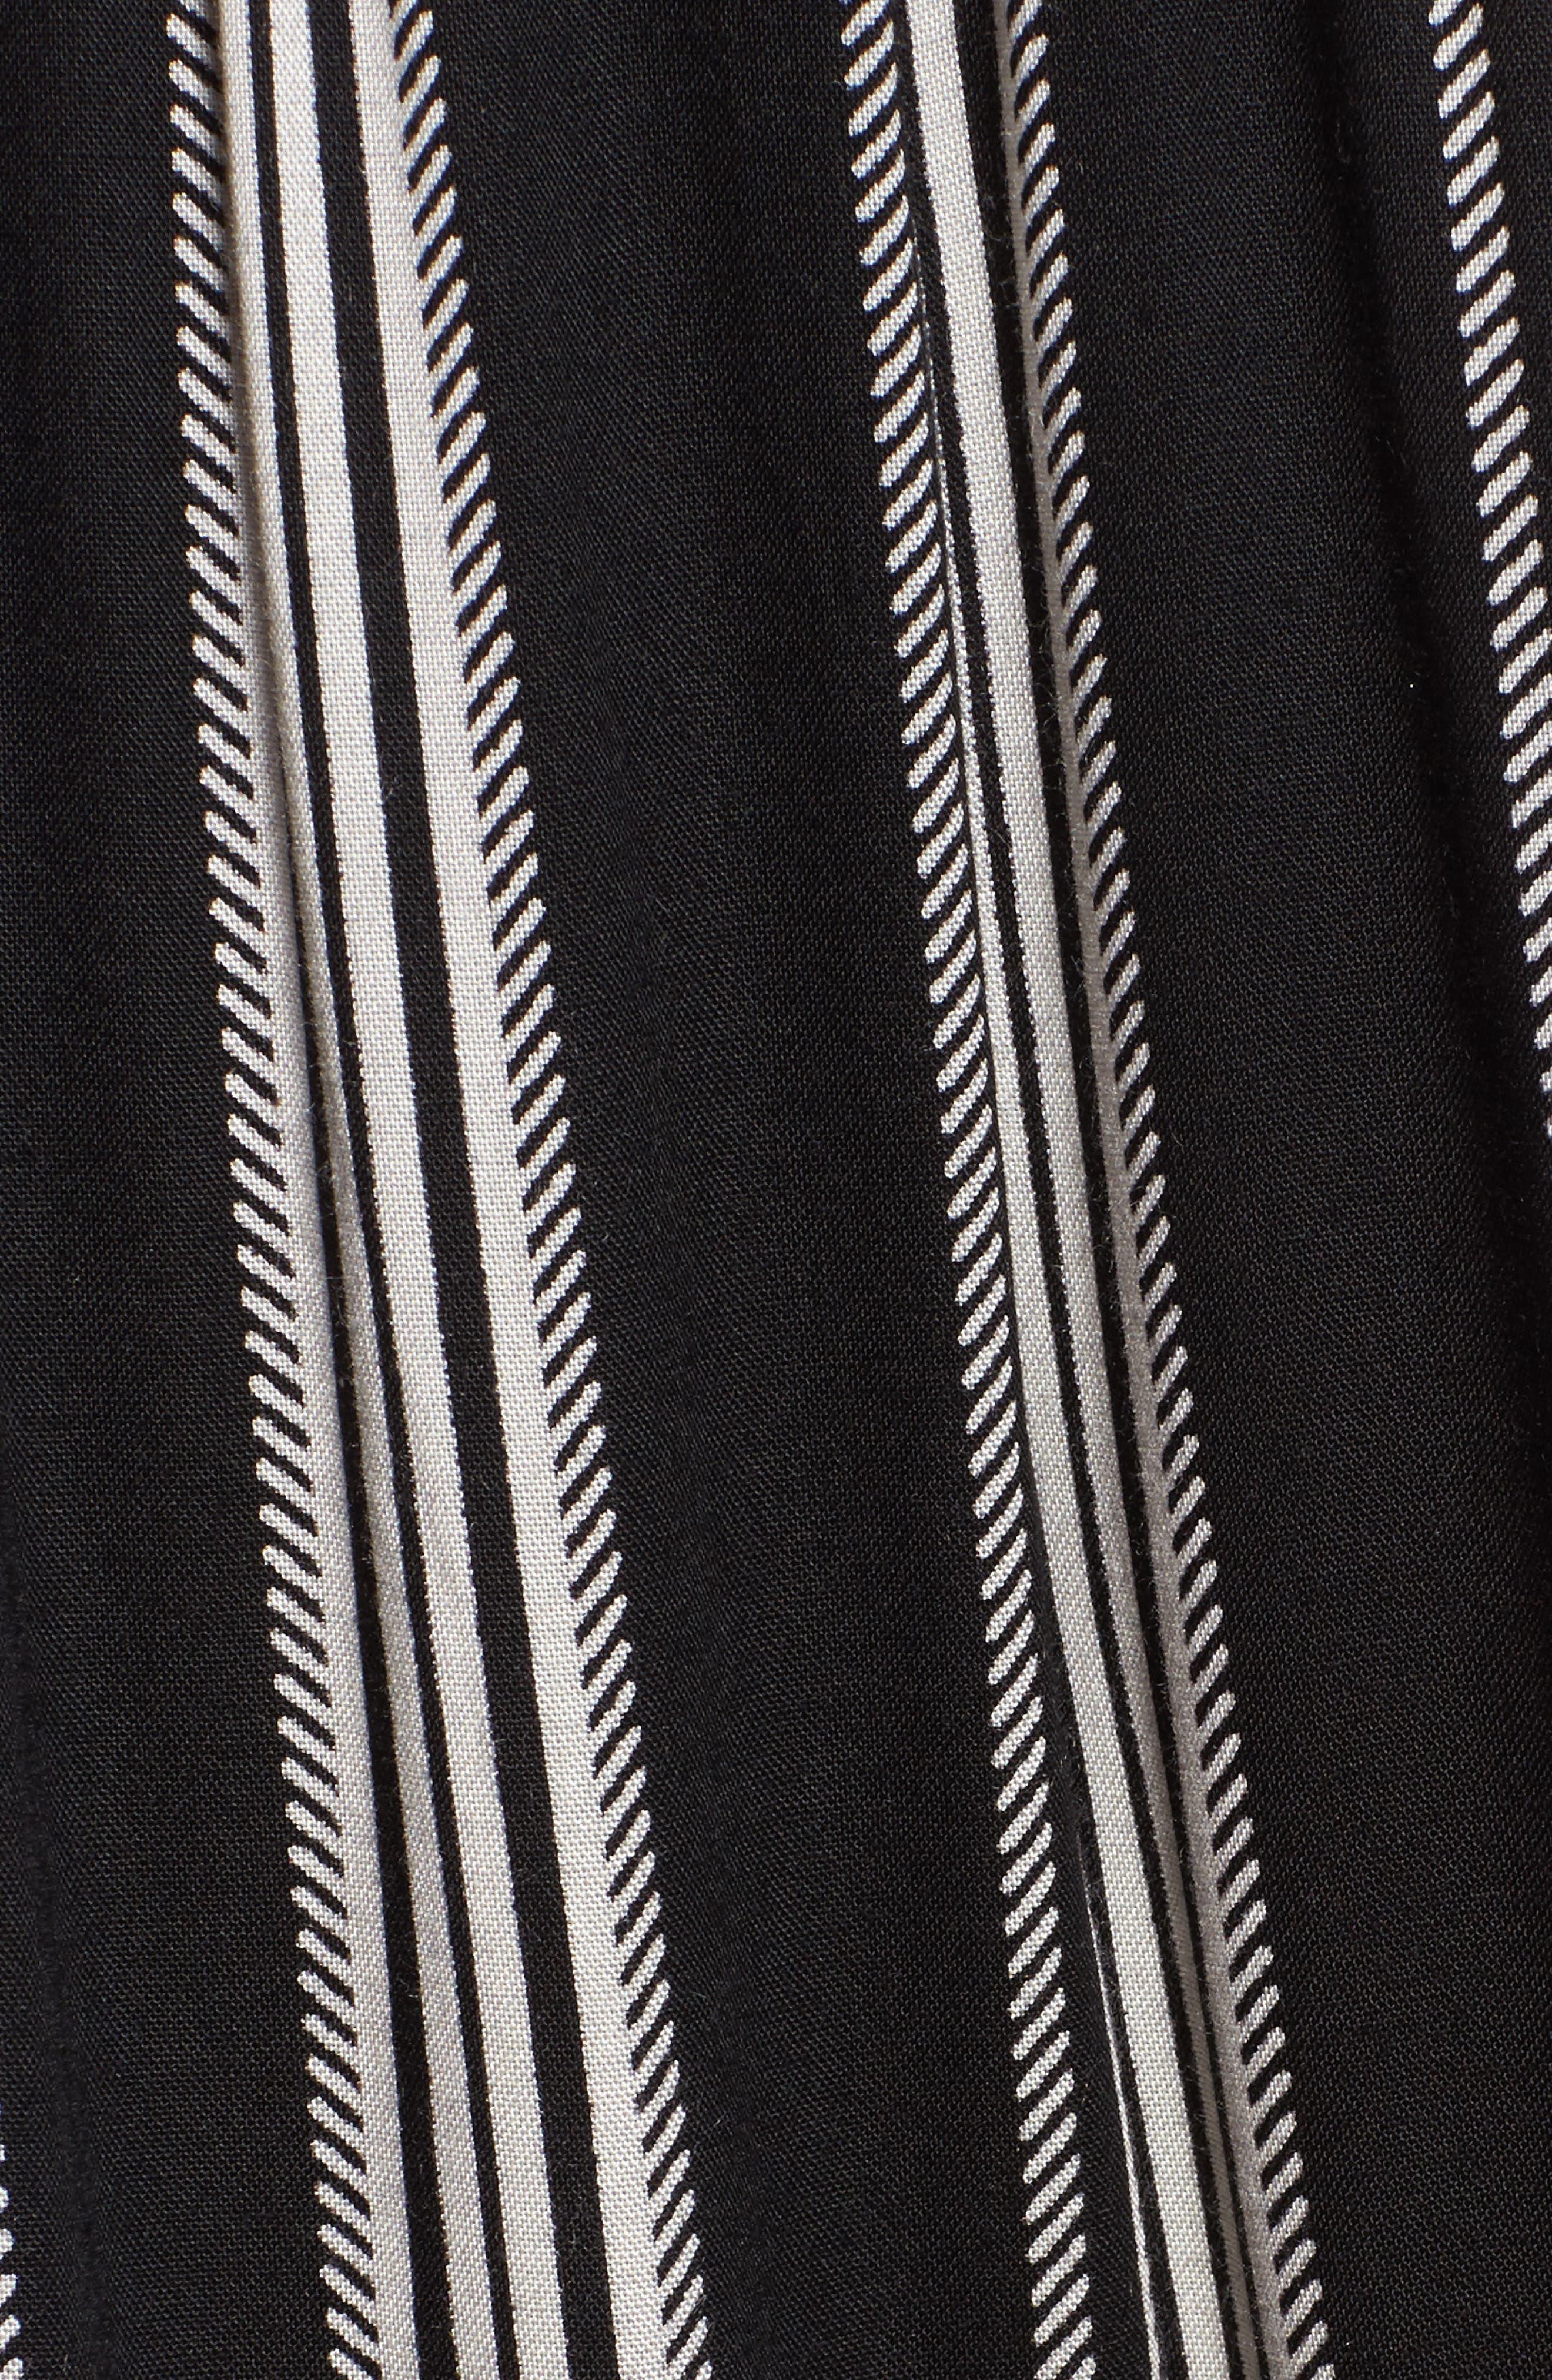 Herringbone Wide Leg Pants,                             Alternate thumbnail 5, color,                             887R-Black/ Ivory